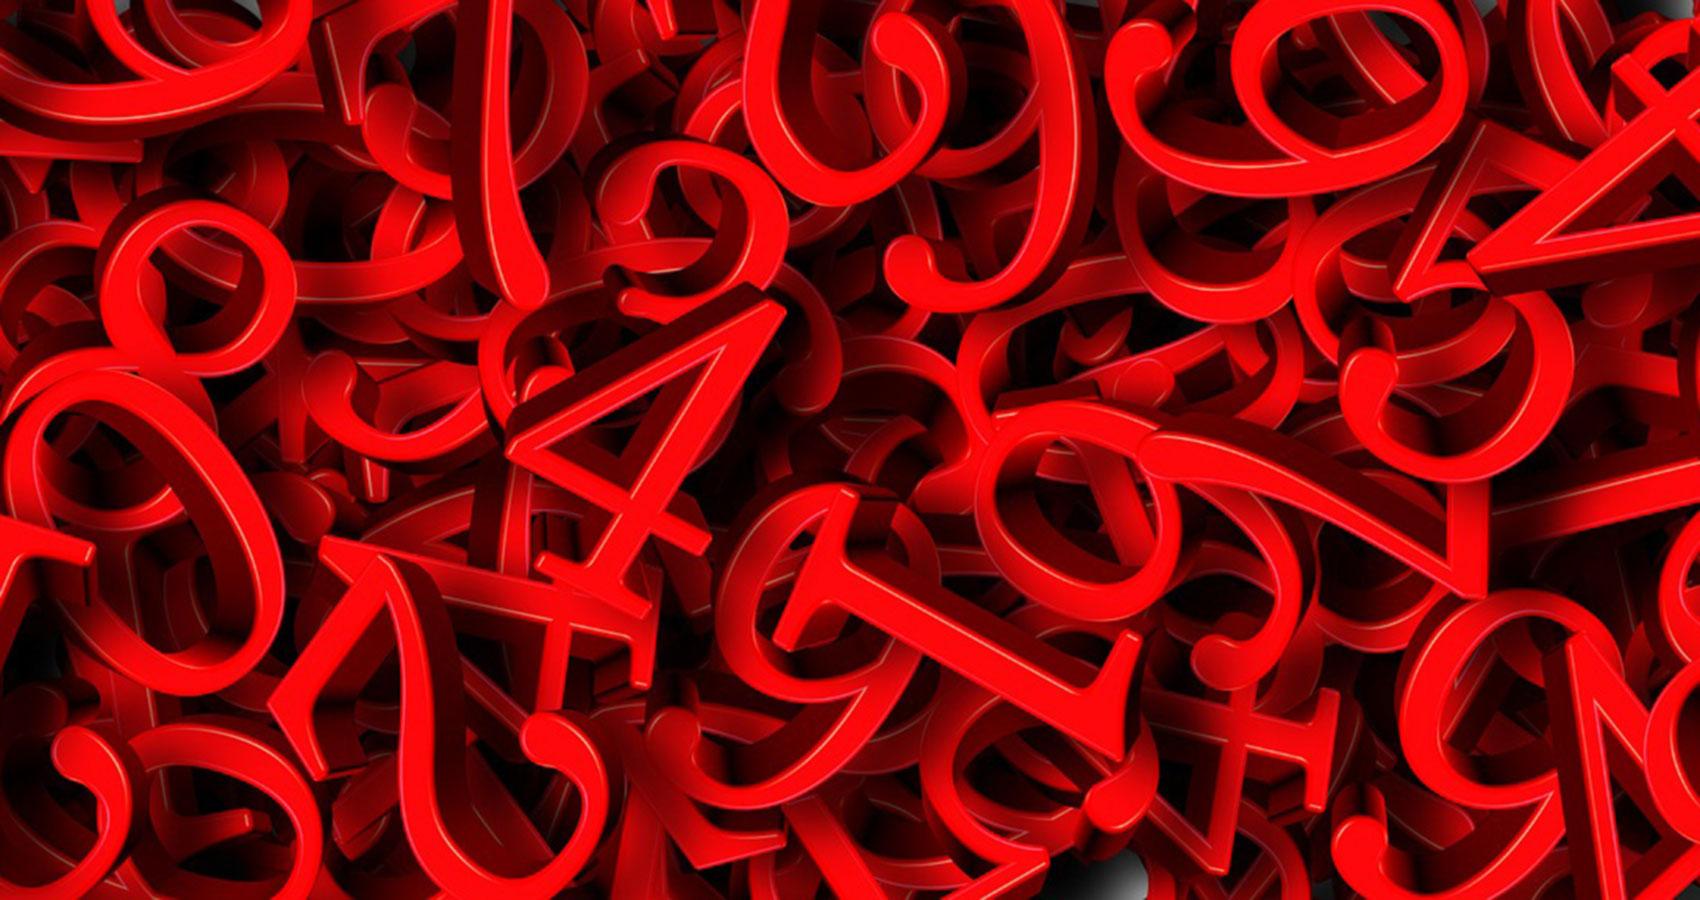 Odd Lovers by Haaris Ali Waqas at Spillwords.com